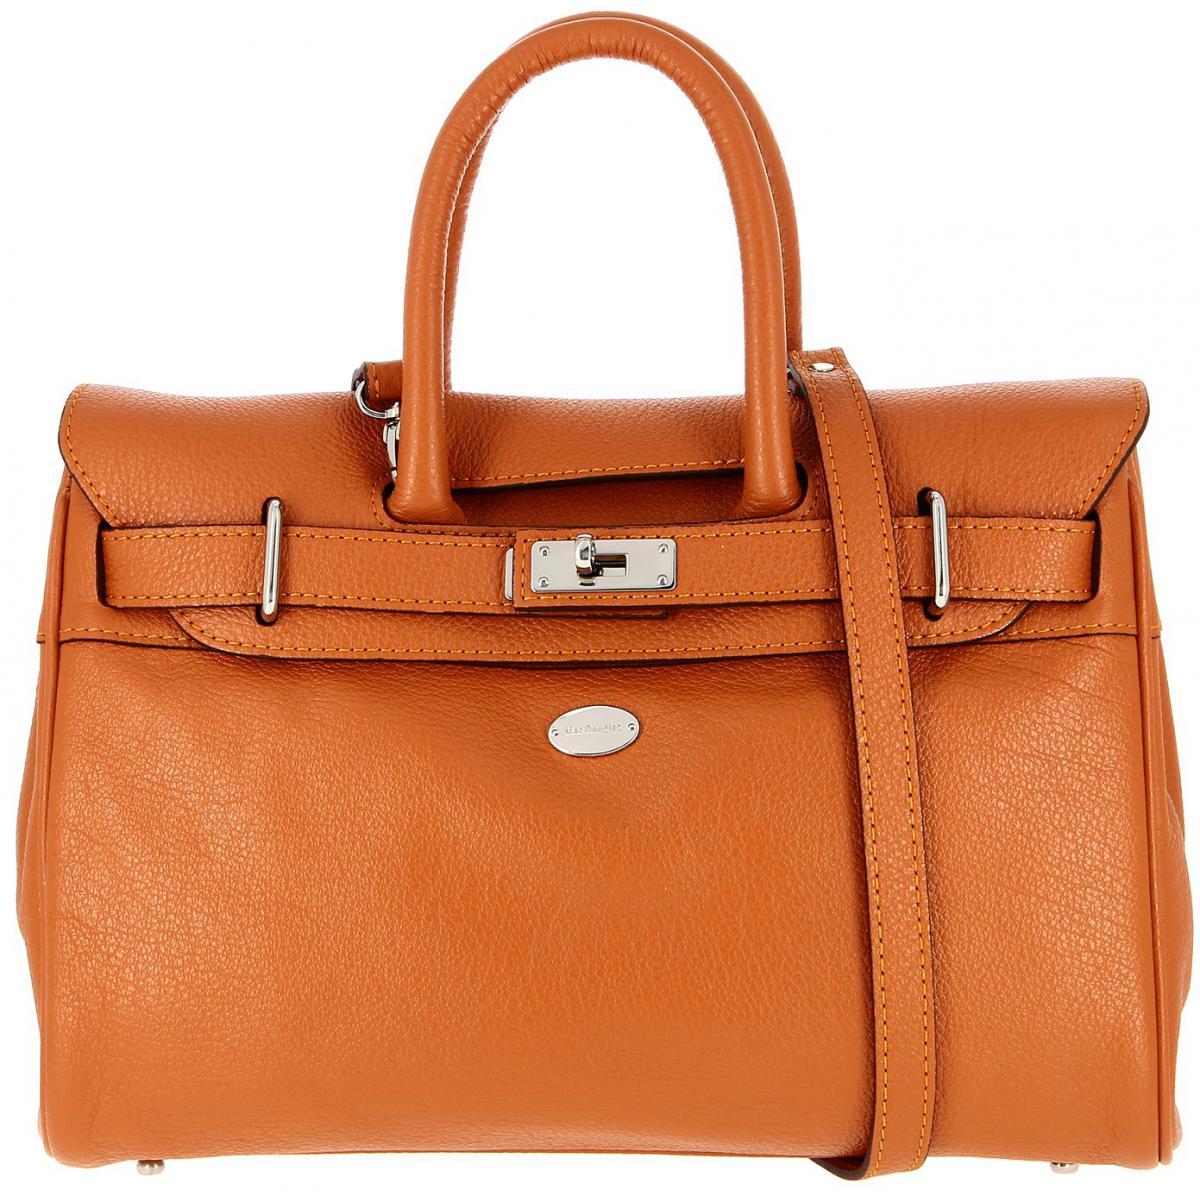 sacs a mains mac douglas orange